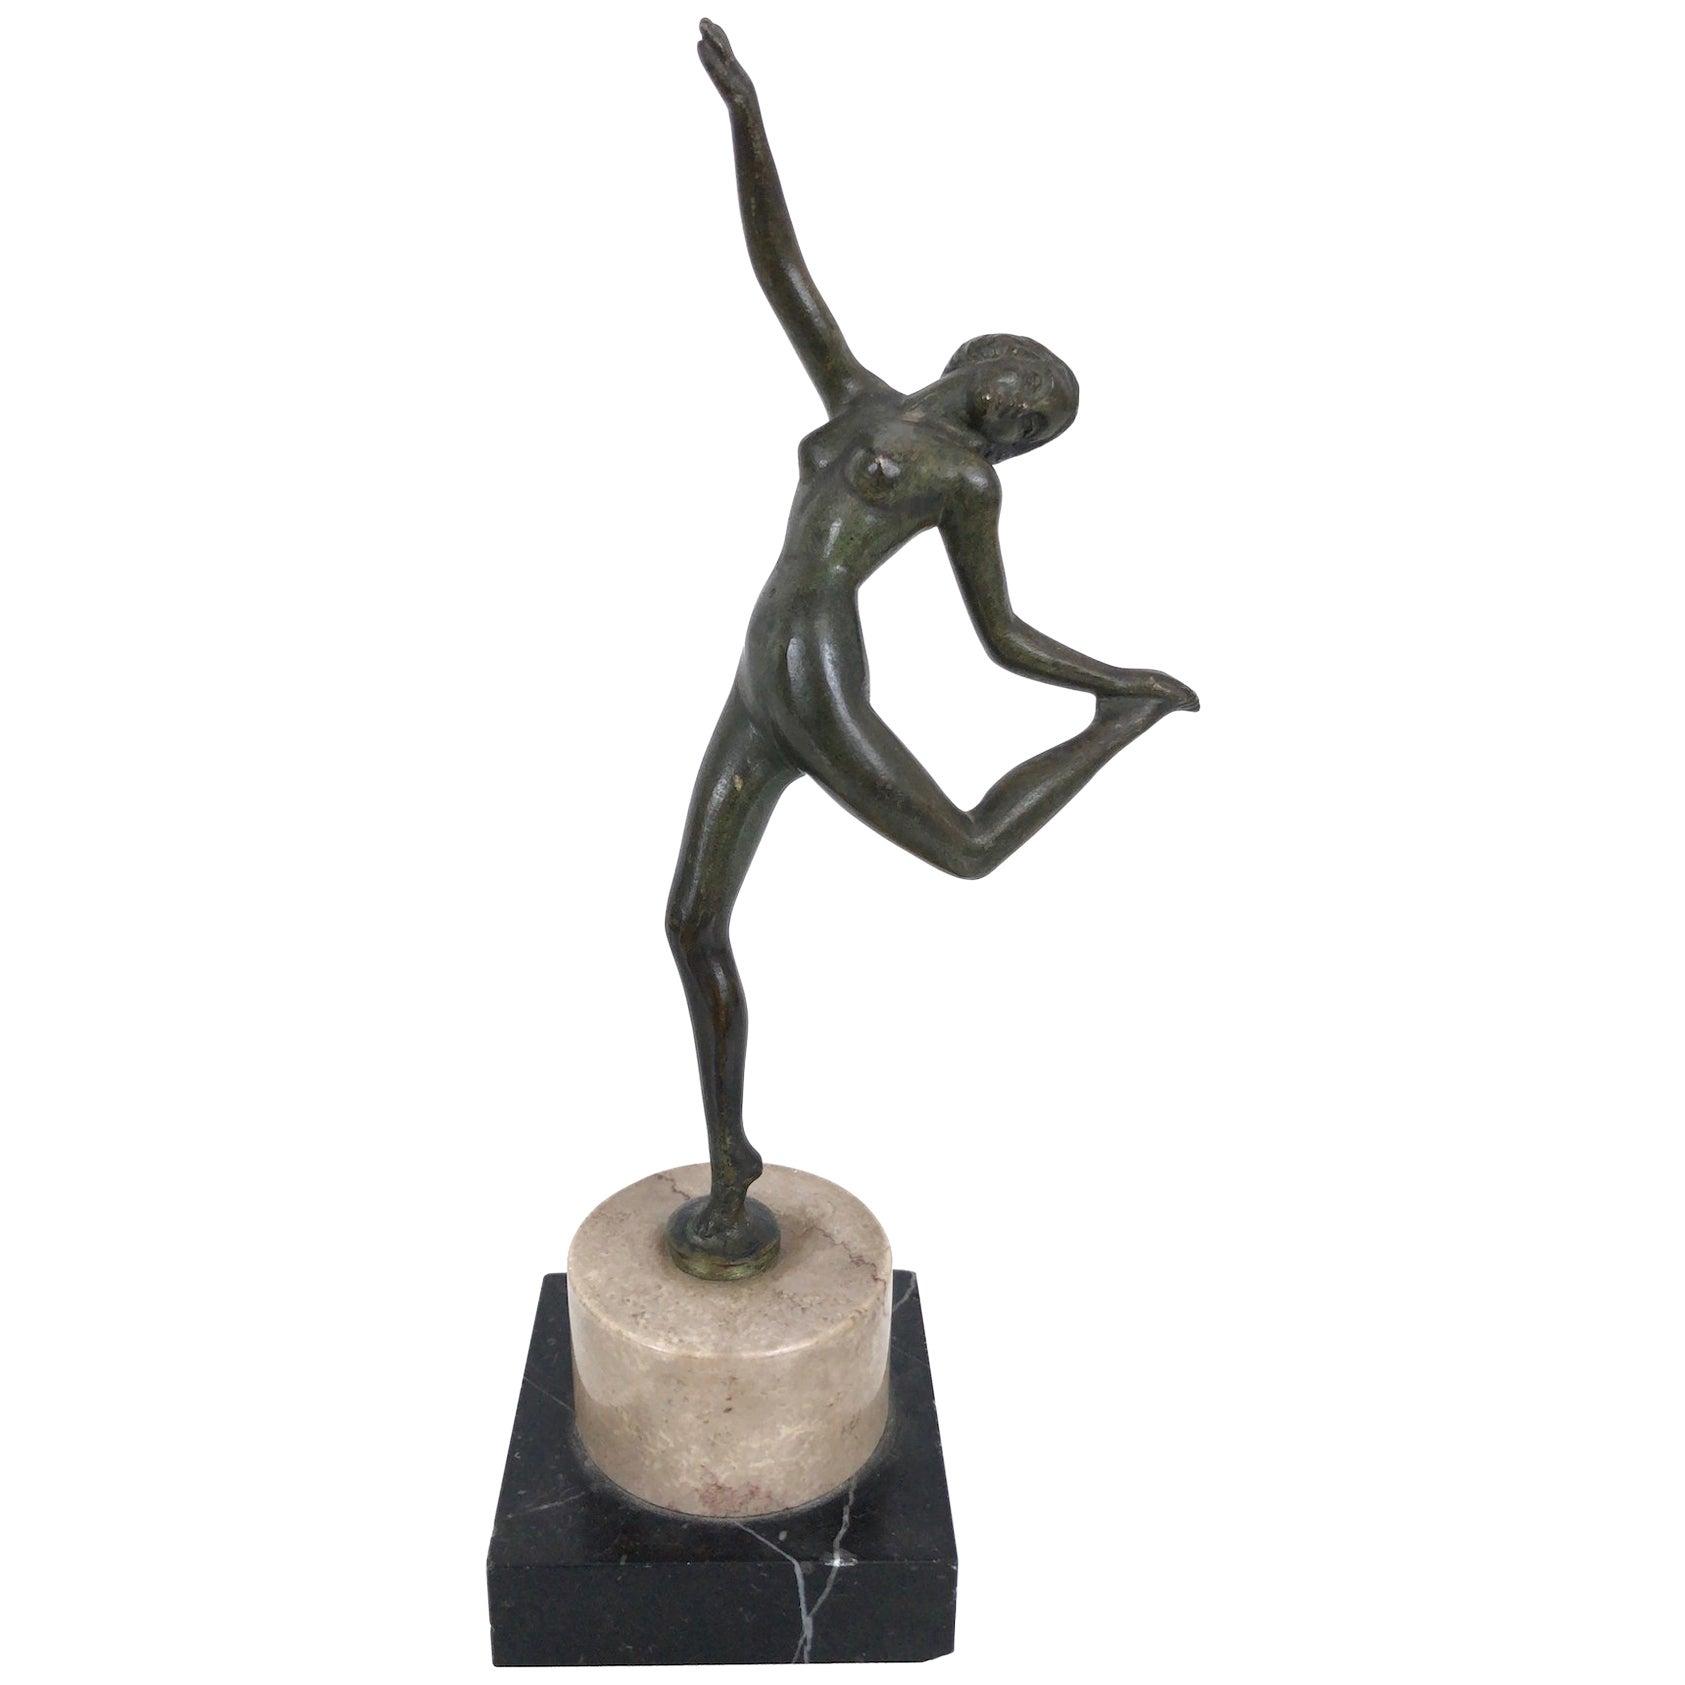 Little Dancing Bronze Sculpture, Art Deco, France, 1930s